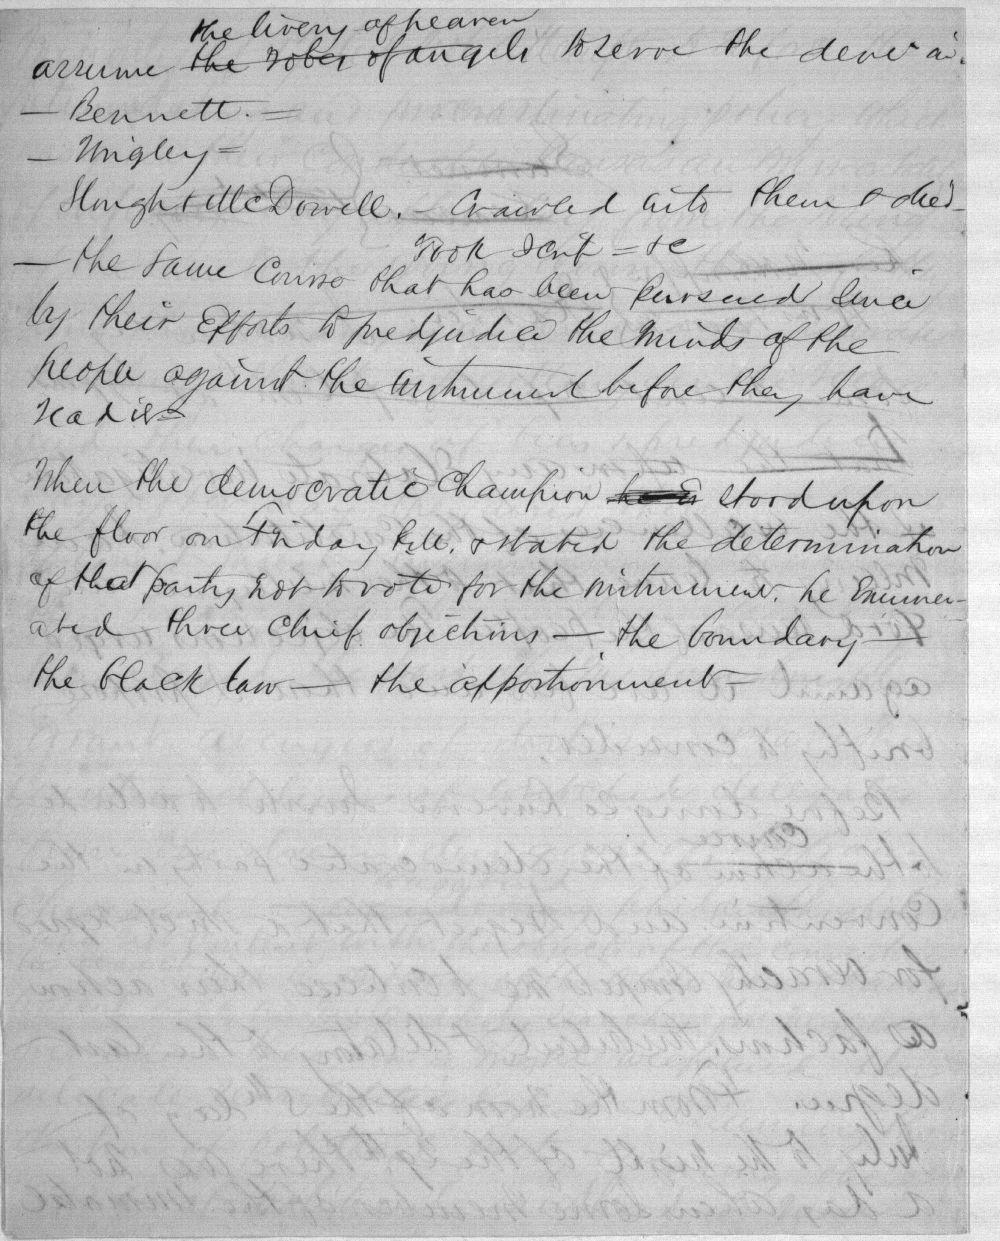 Speech written by John J. Ingalls - 7